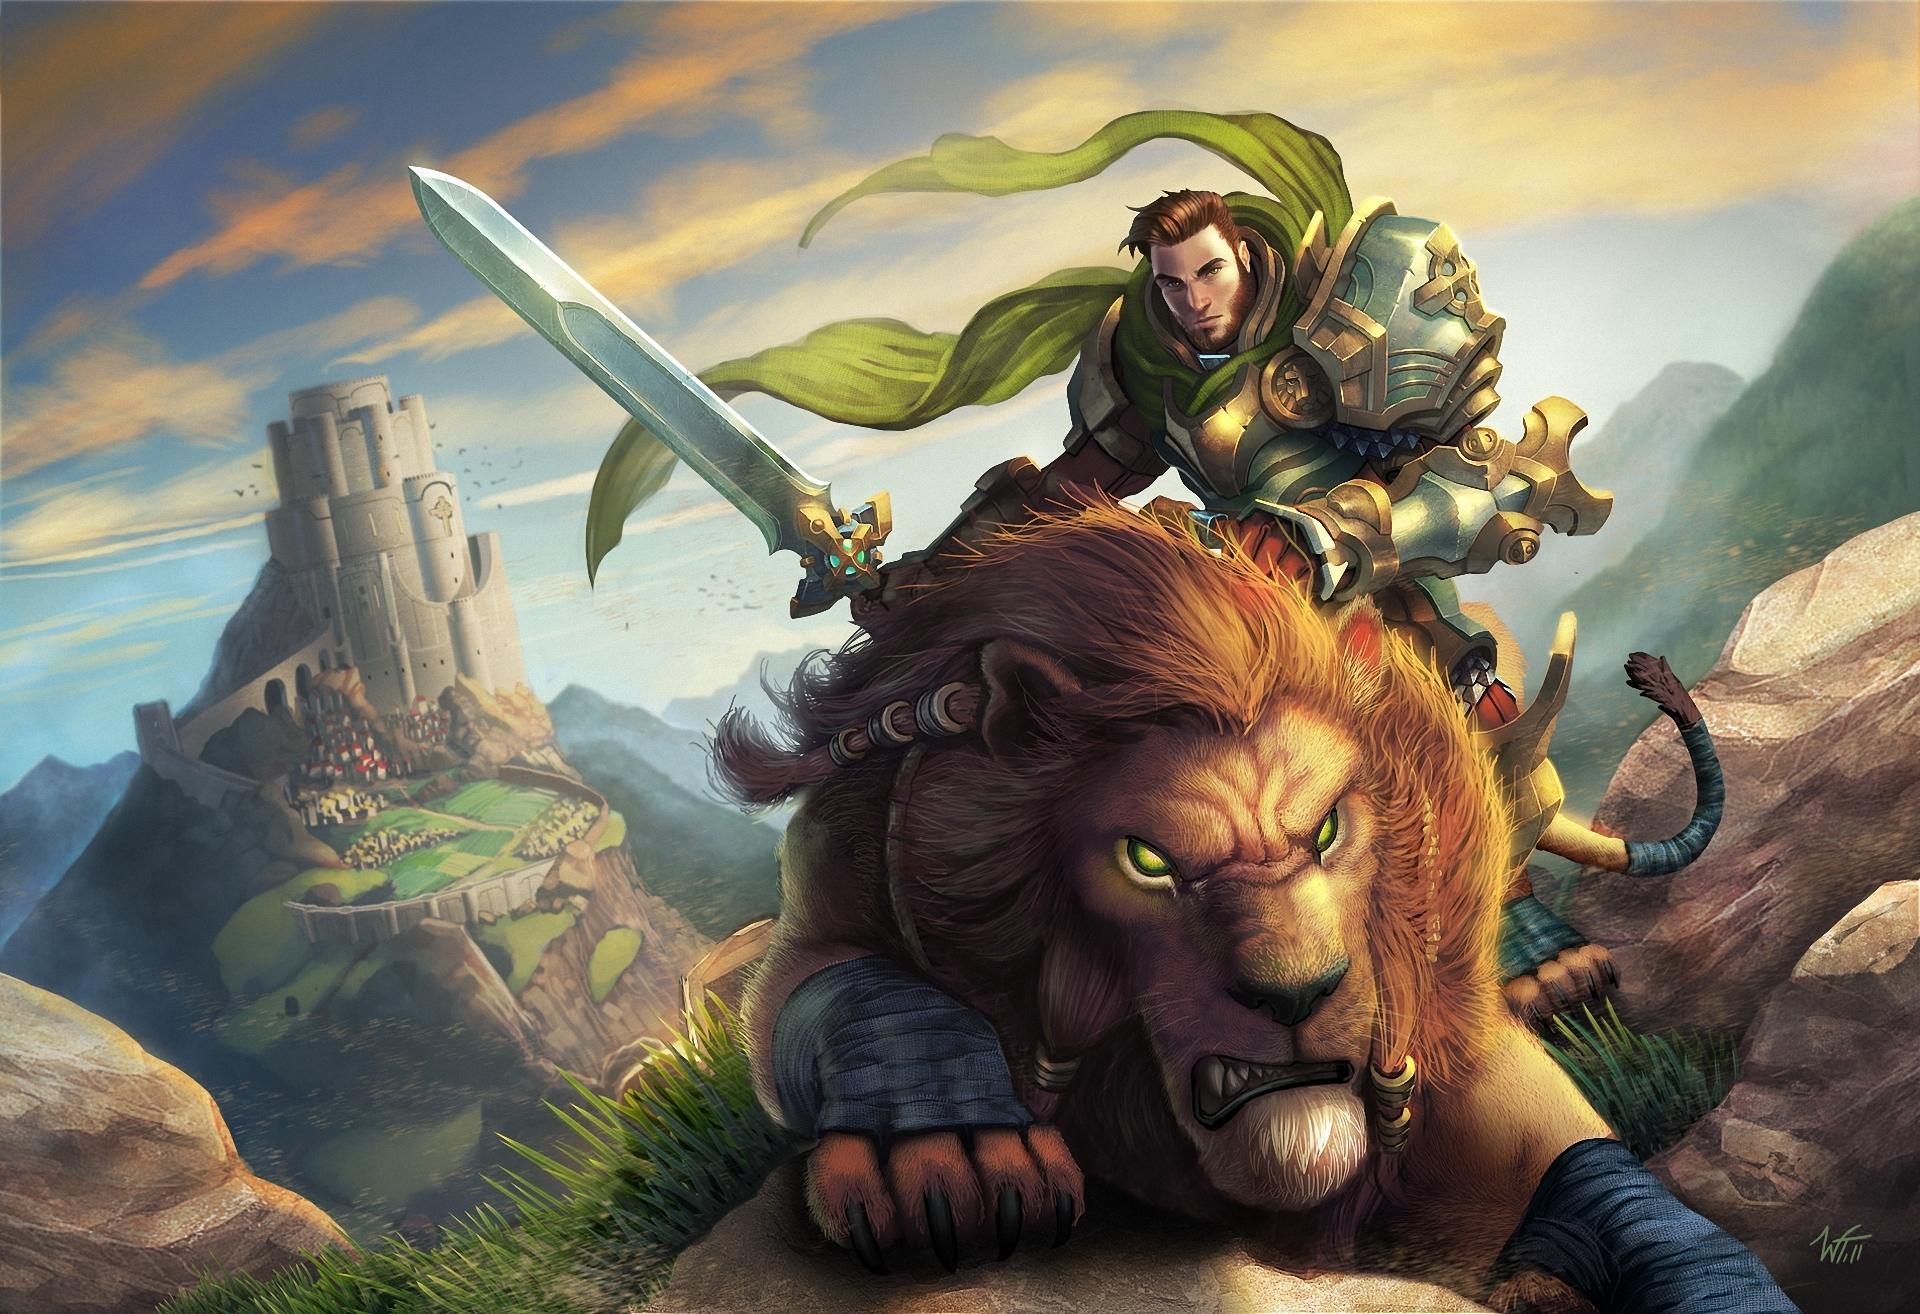 World of WarCraft WoWcats Lions Warrior Men Armor Sword castle fantasy 1920x1314